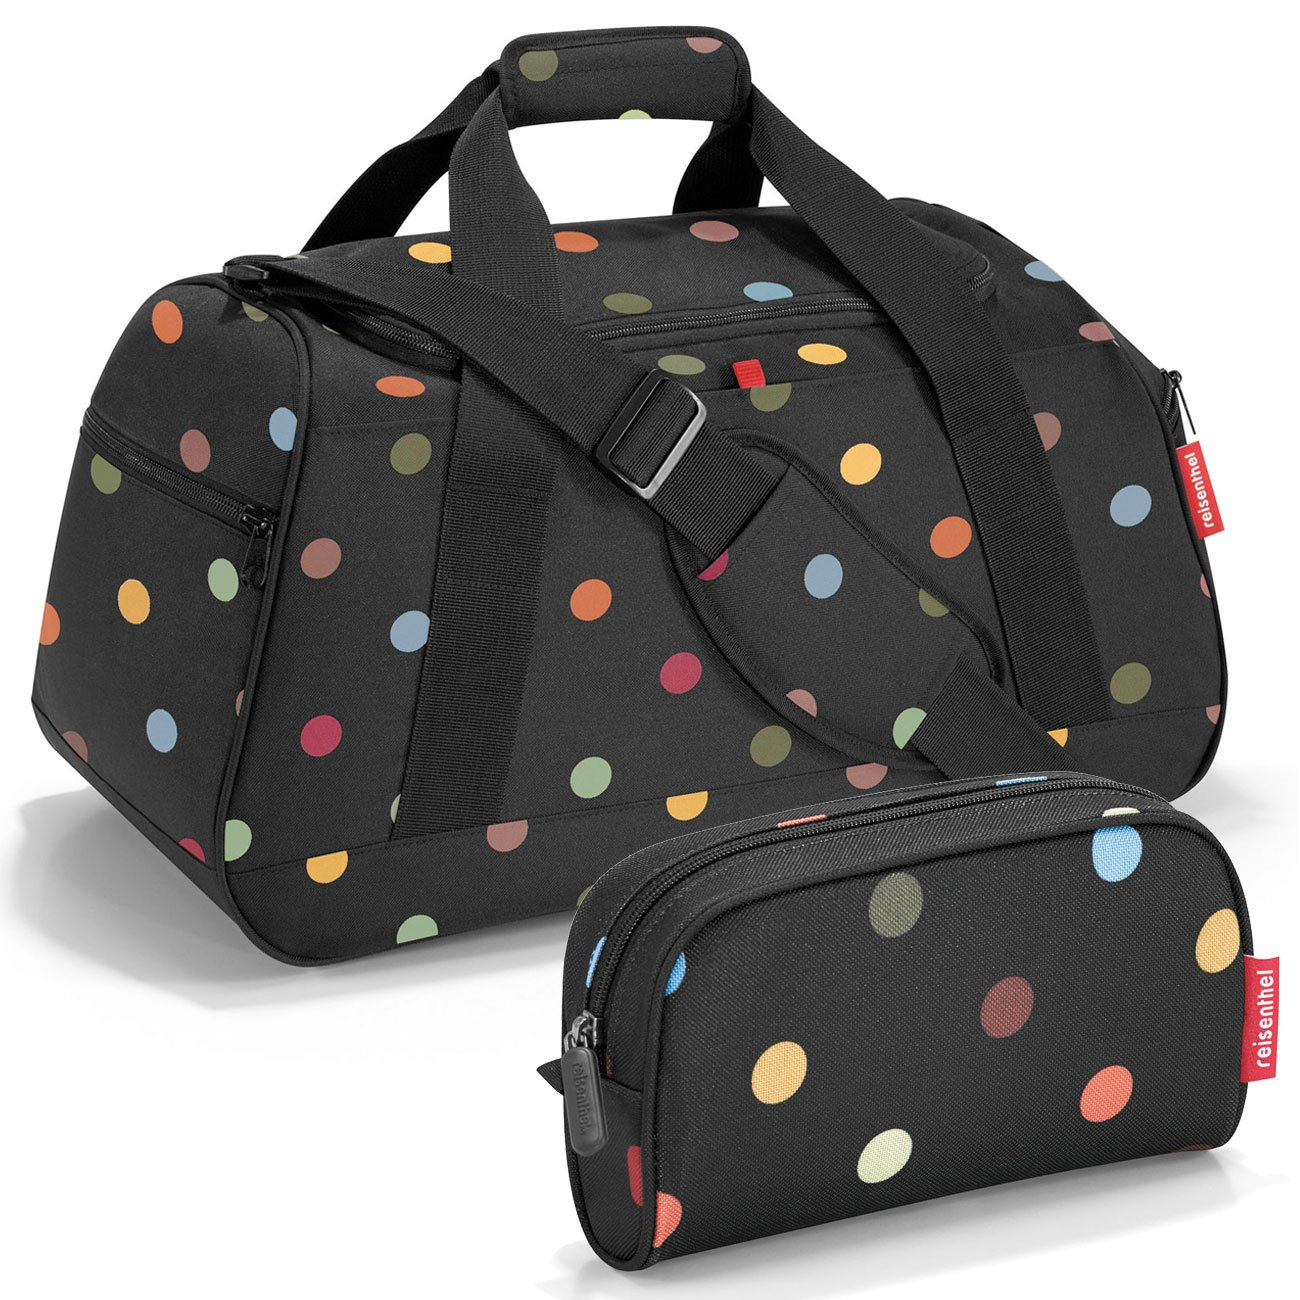 reisenthel Exklusiv-Set: activitybag Sporttasche mx7009 Plus GRATIS makeupcase Kulturtasche - dots